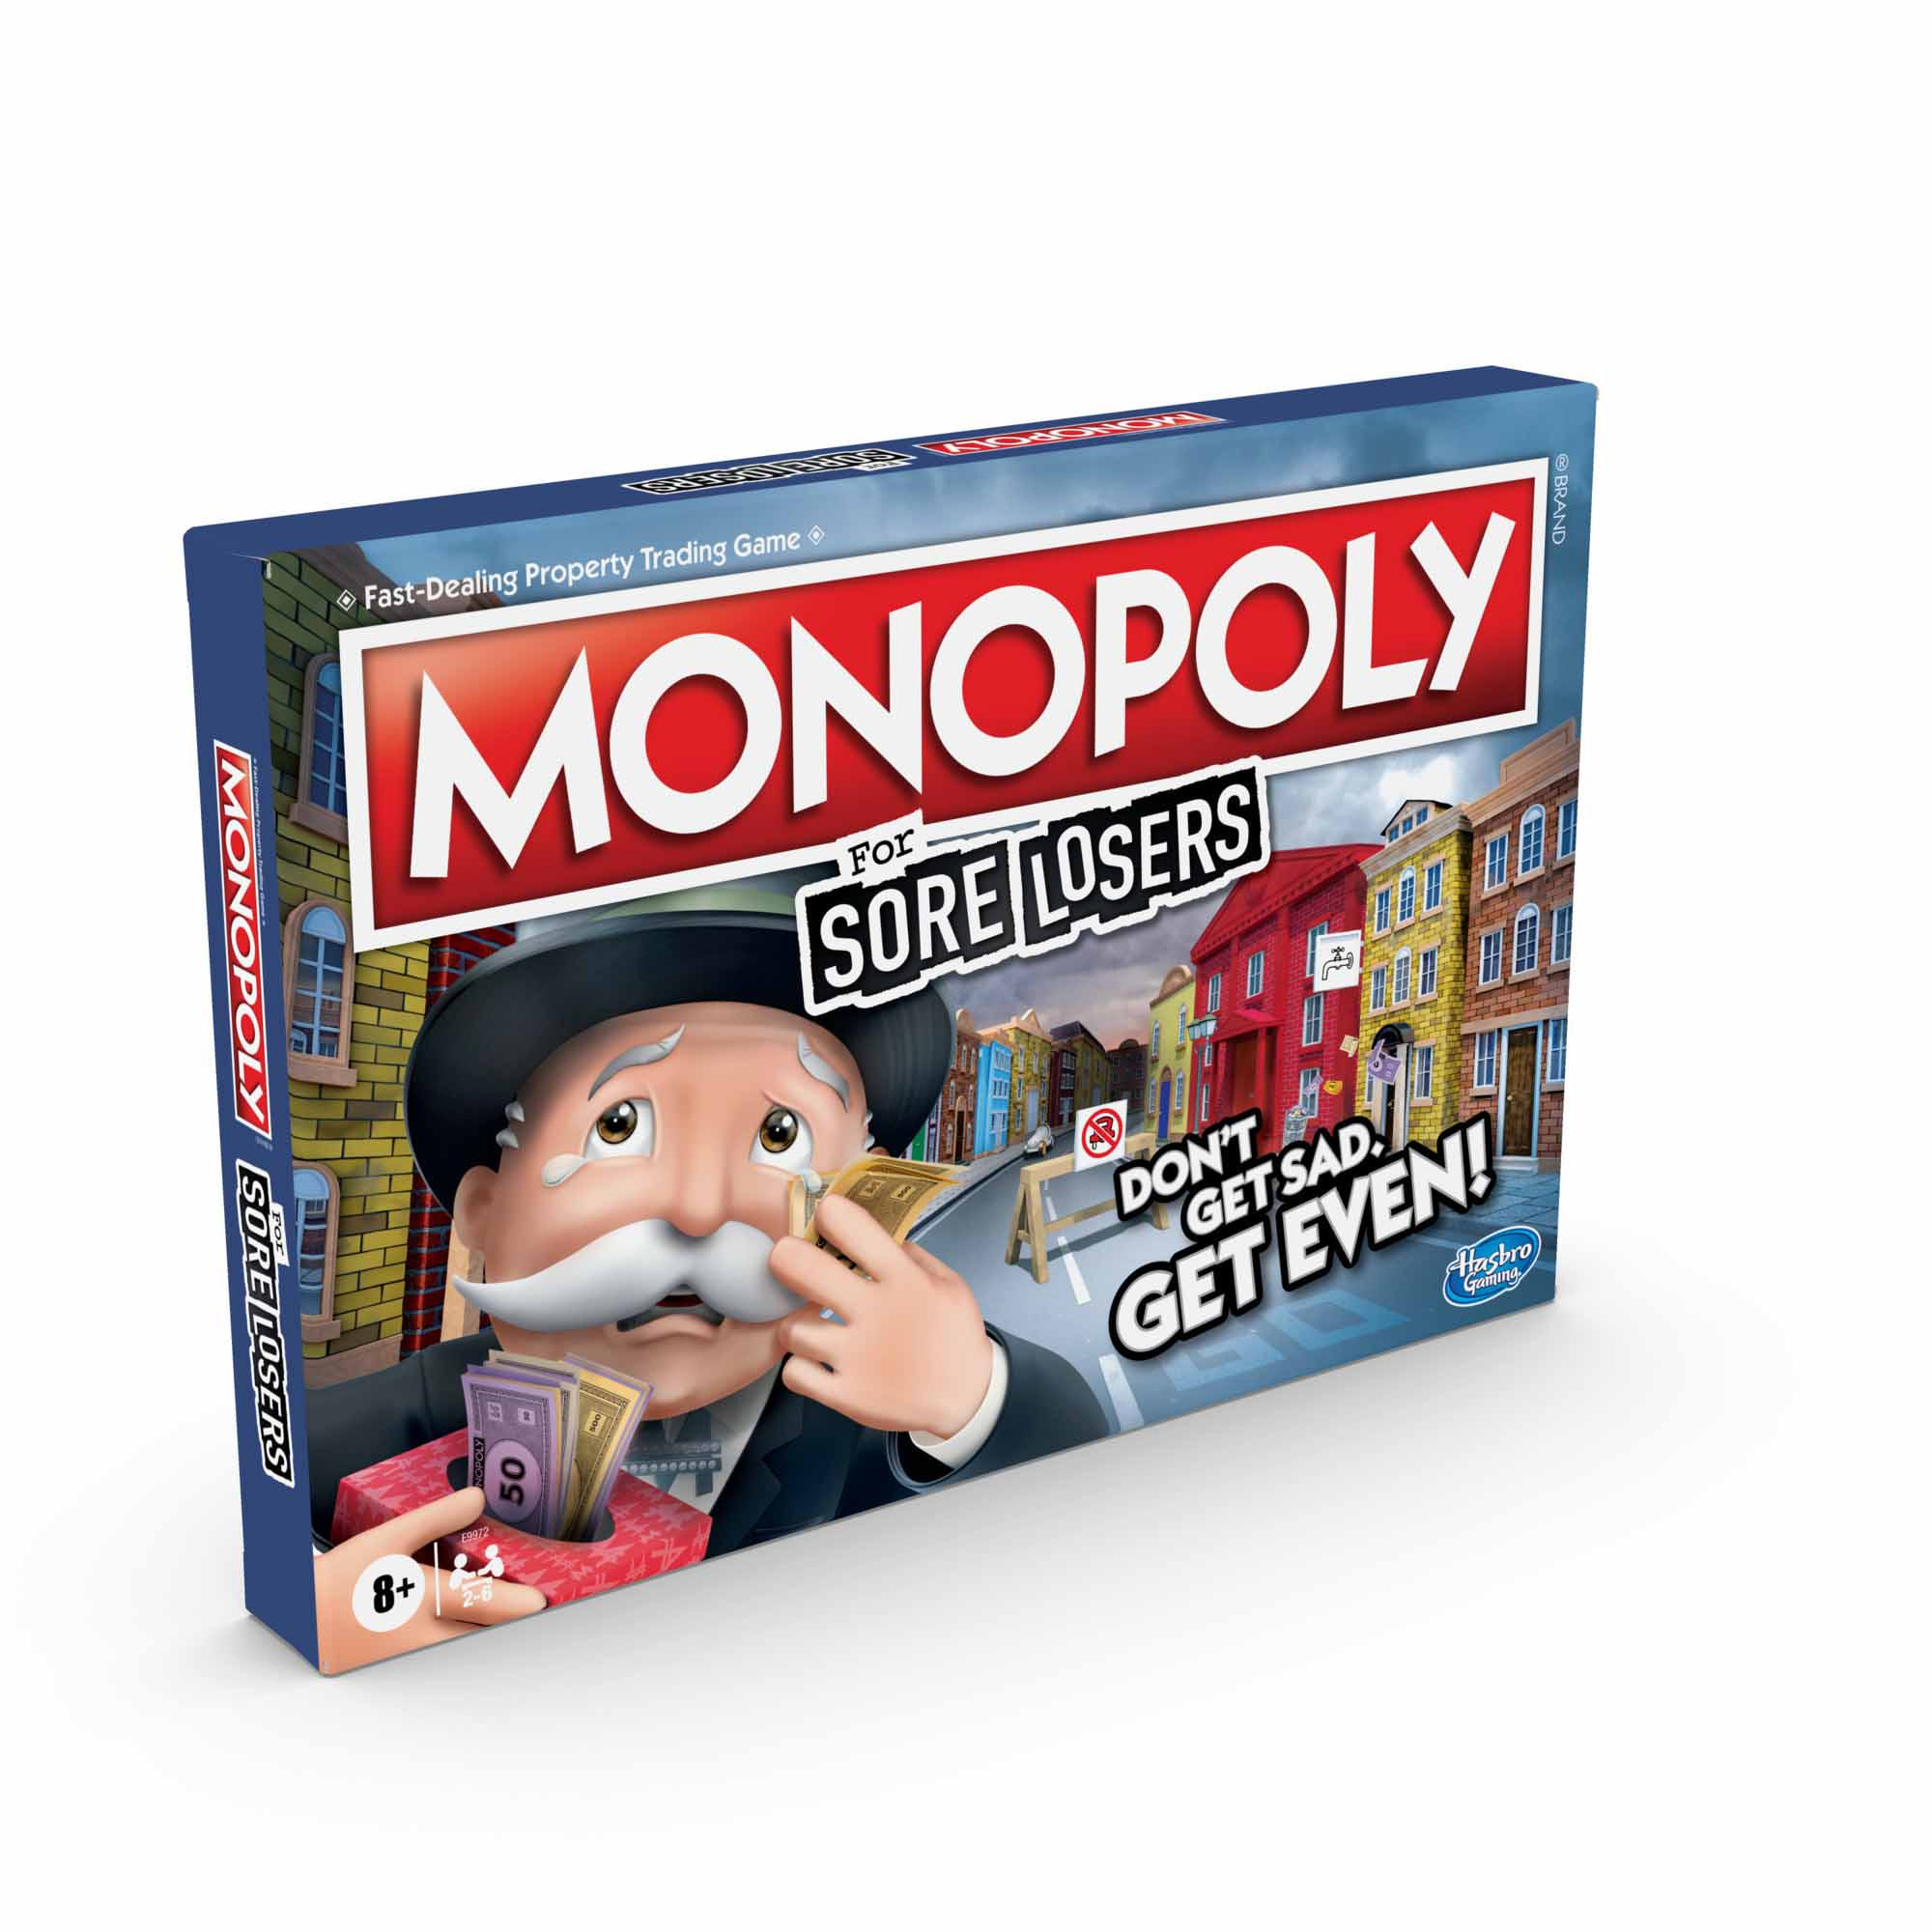 Monopoly For Sore Losers -lautapeli ikäryhmälle 8+